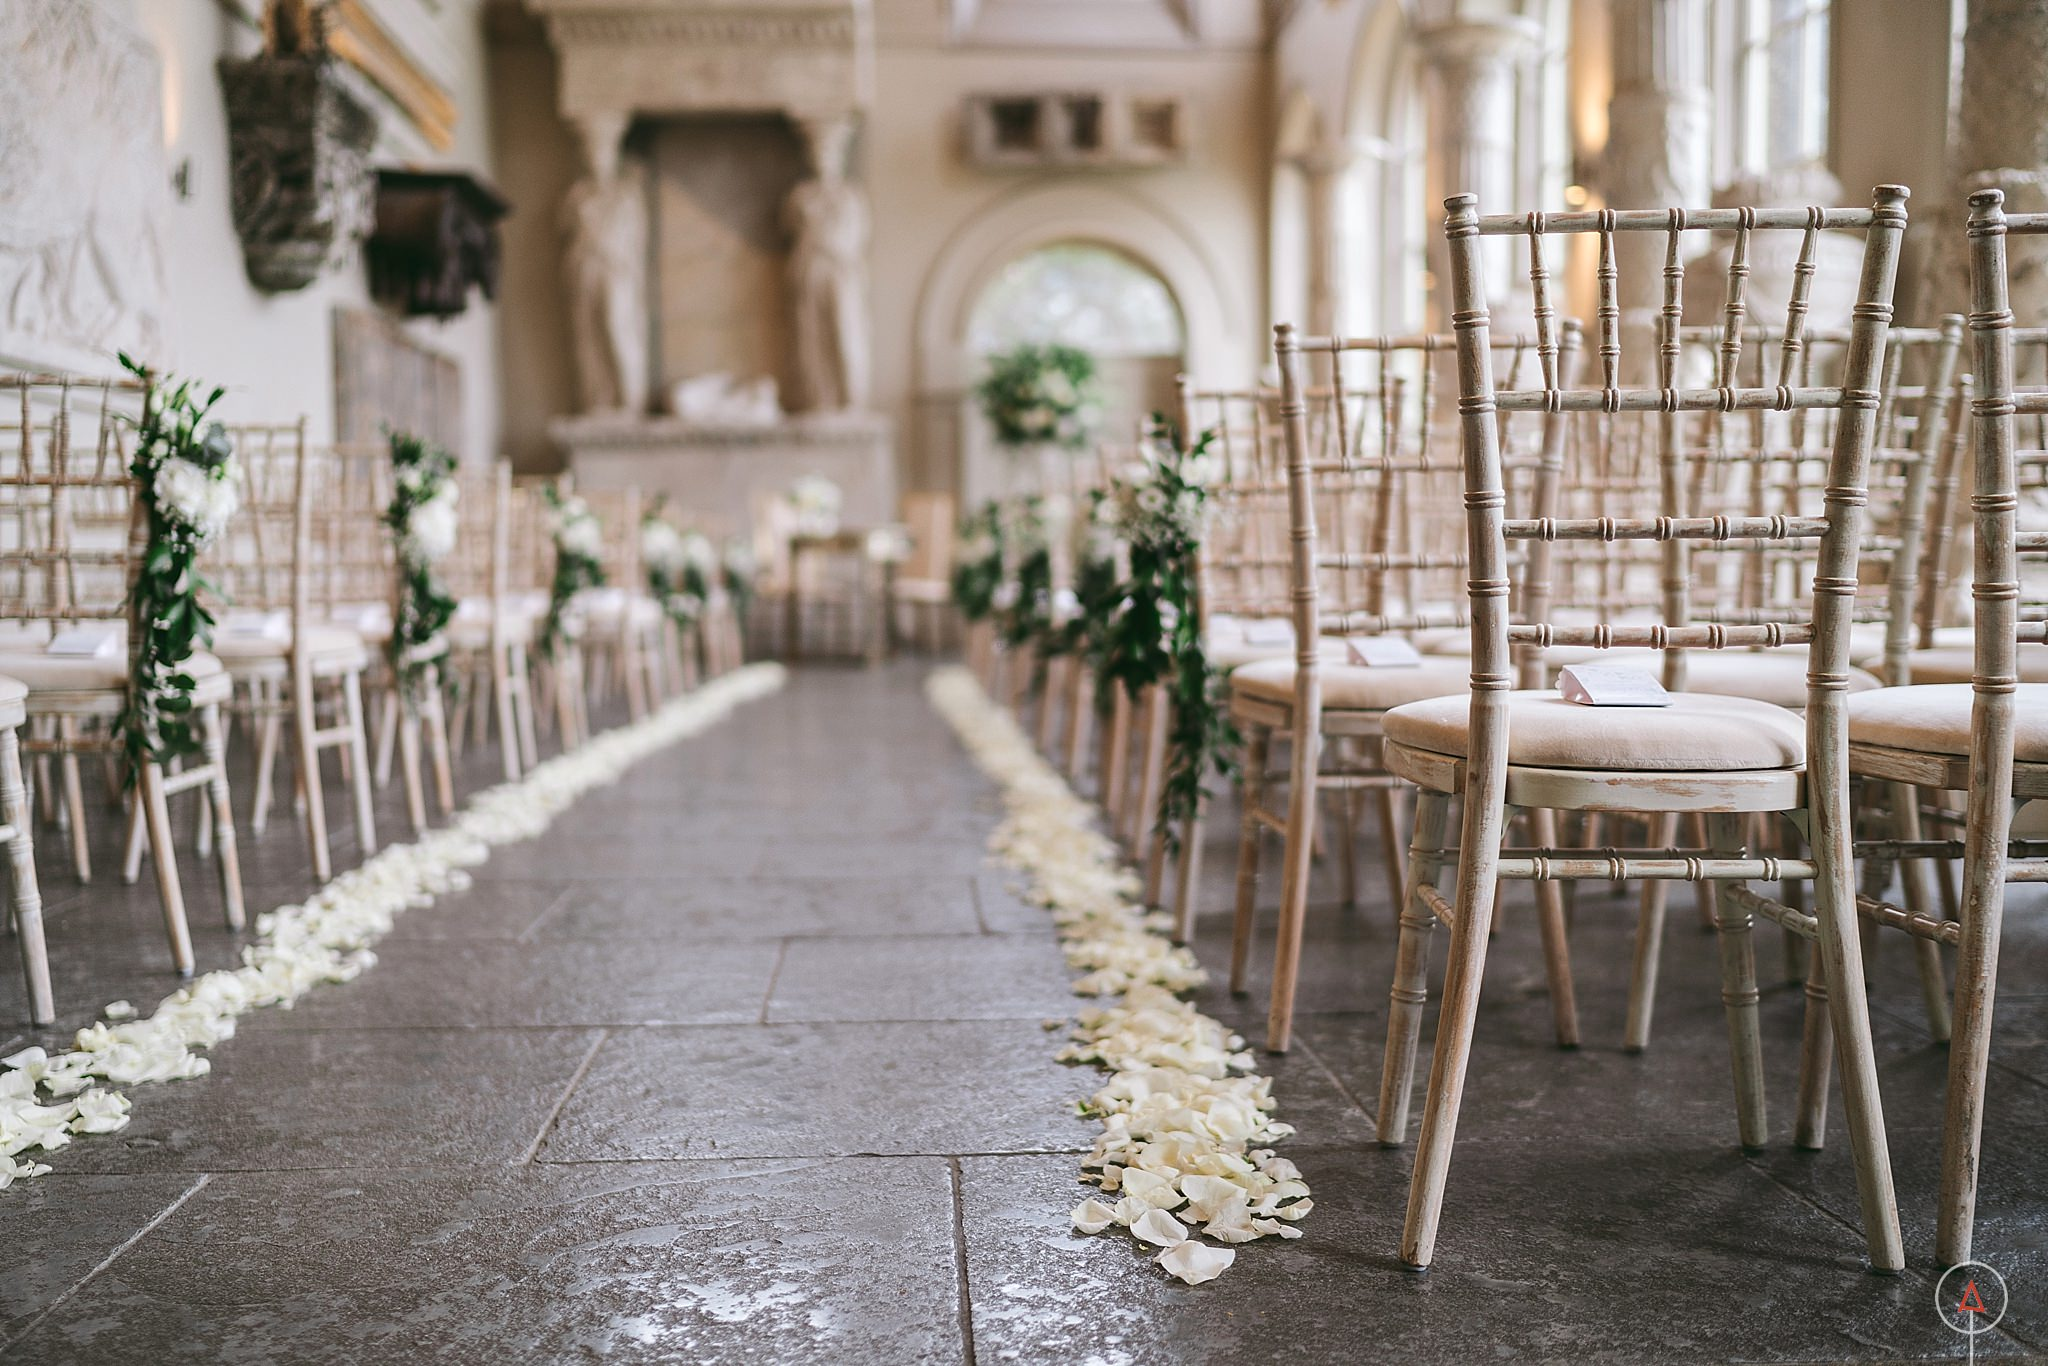 cardiff-wedding-photographer-aga-tomaszek_0208